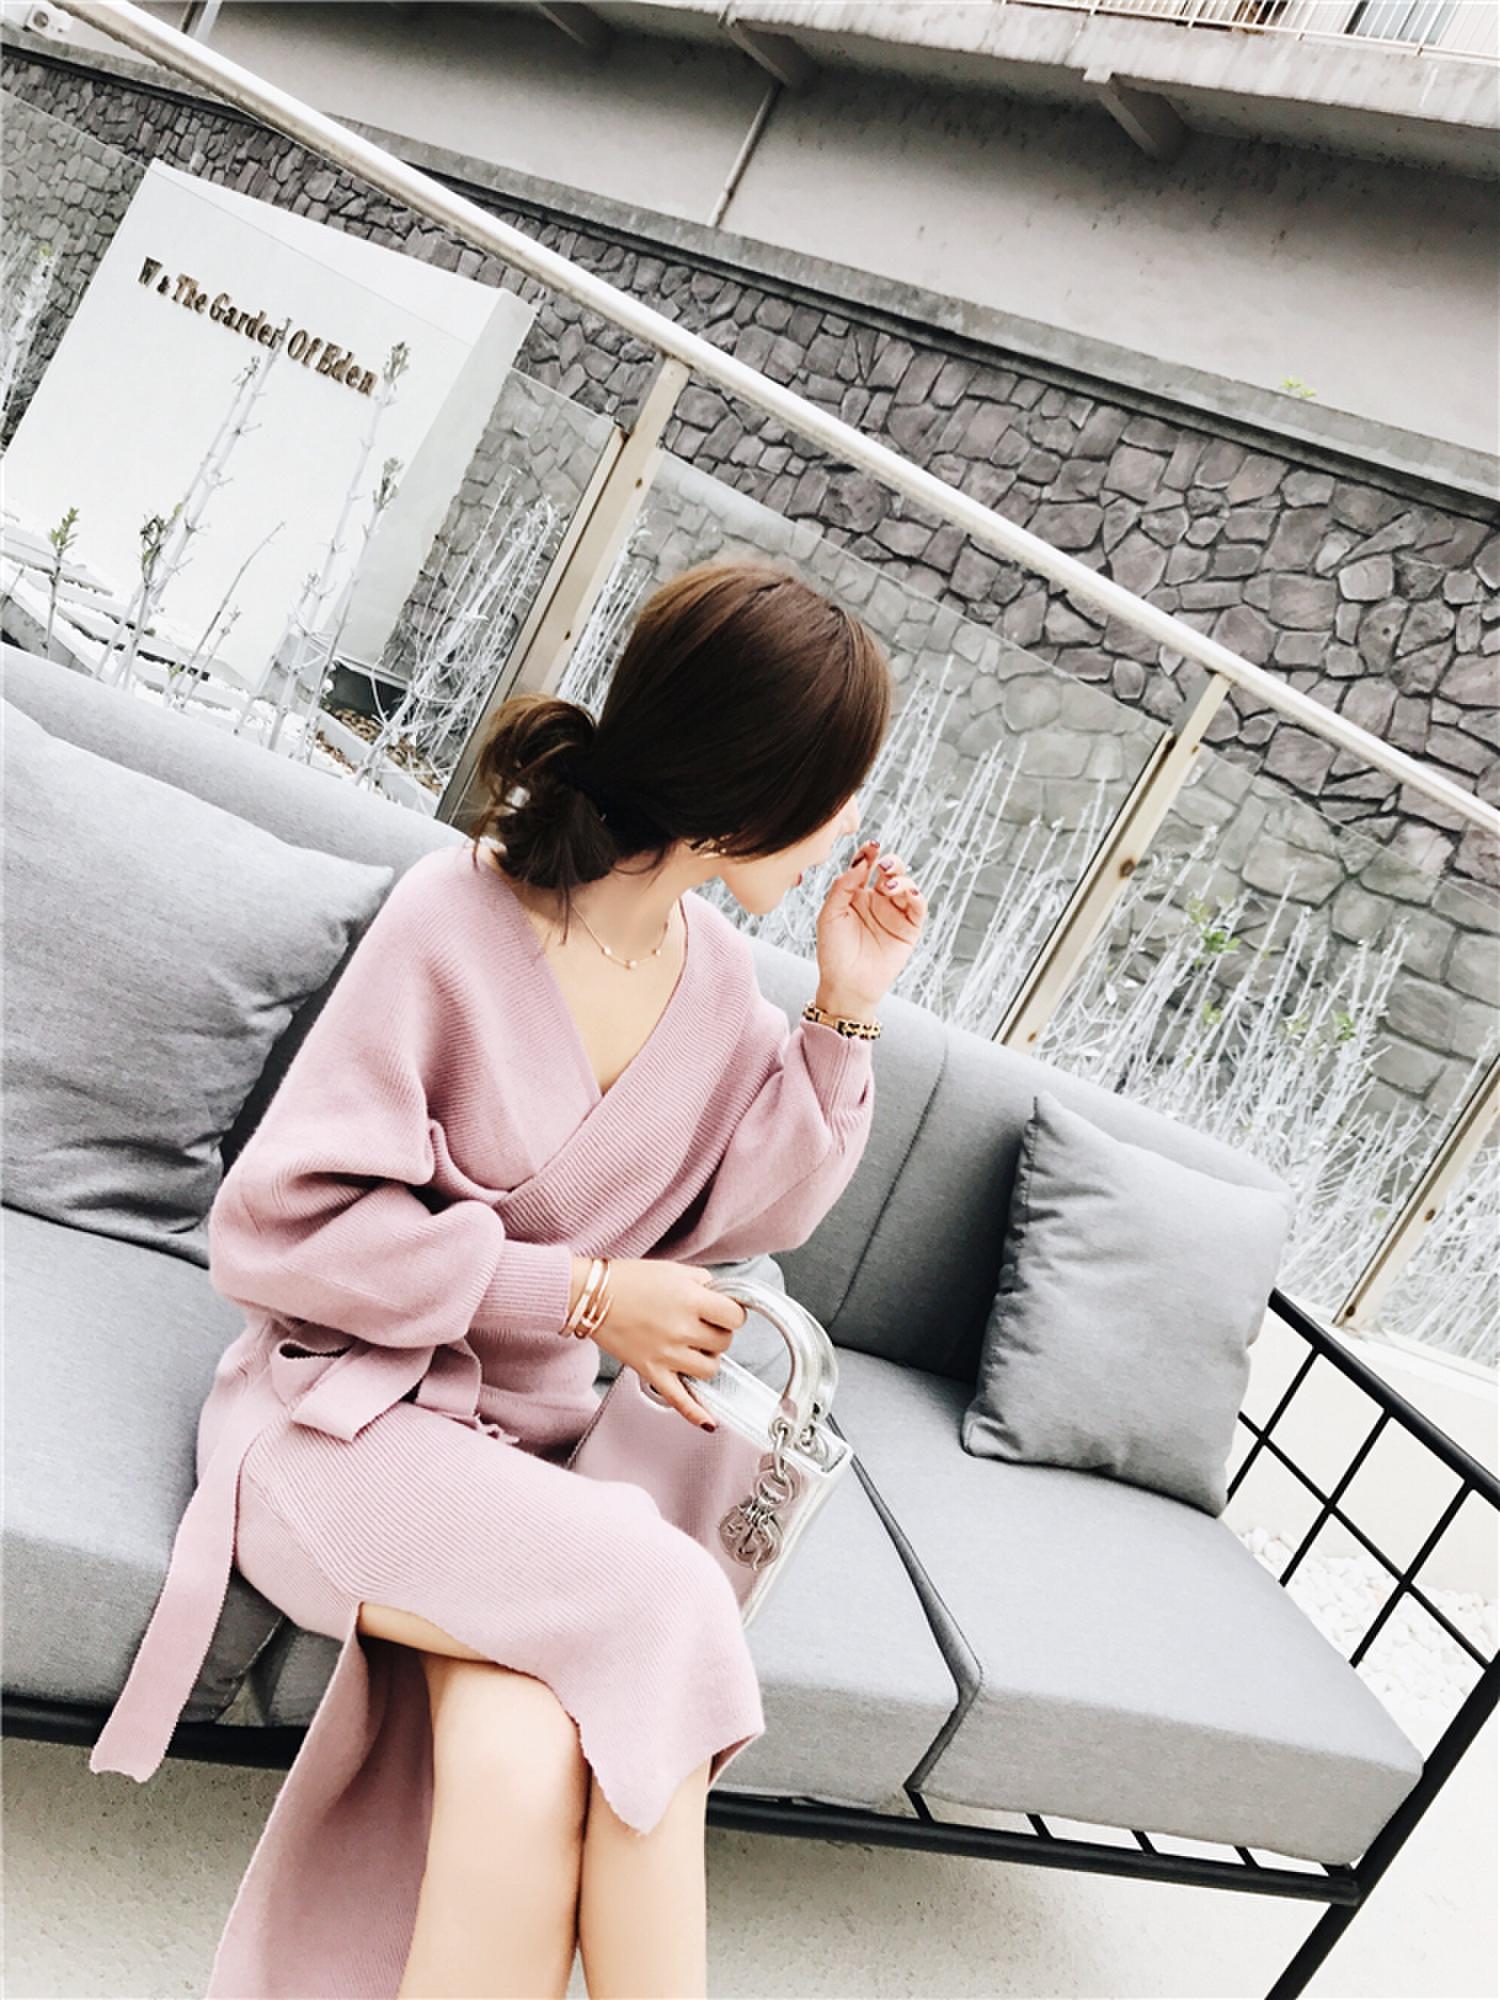 Magro V neck Robe Femme Vestido Moda Lace-up Vestido Famale Outono Inverno Vestidos Longos Da Luva das Mulheres OL elegante Vestido de tricô